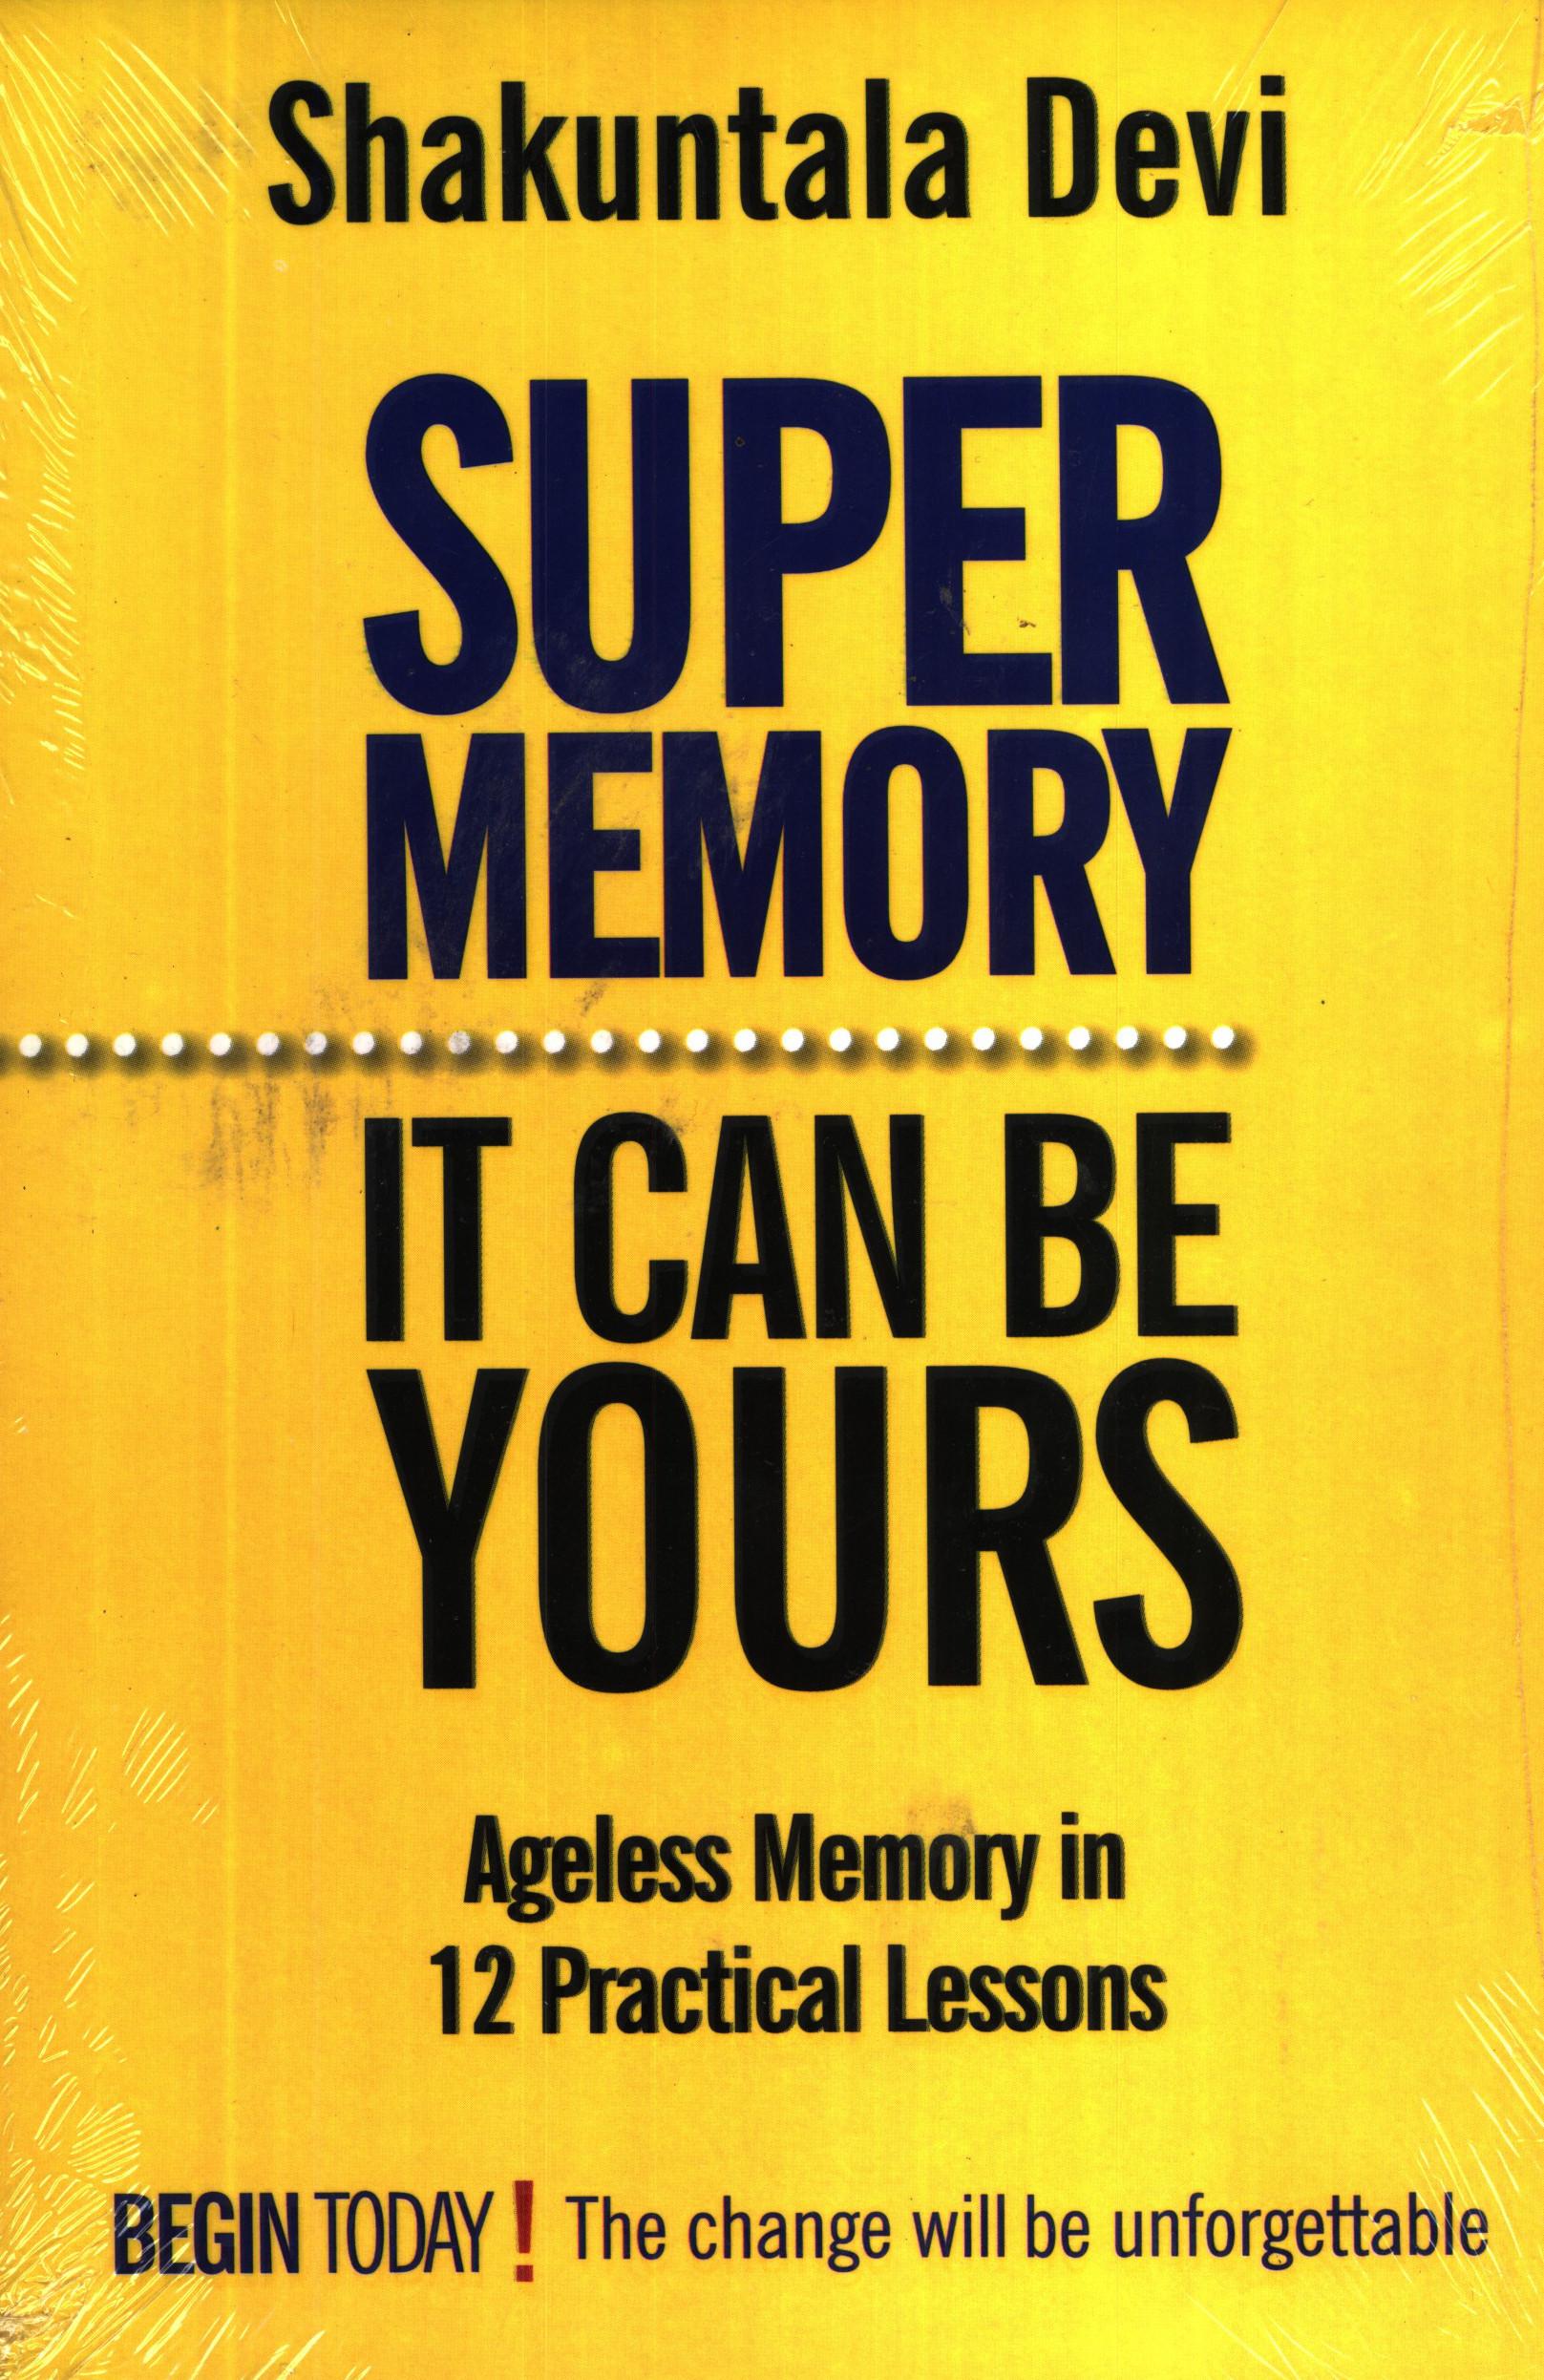 Super Memory by Shakuntala Devi